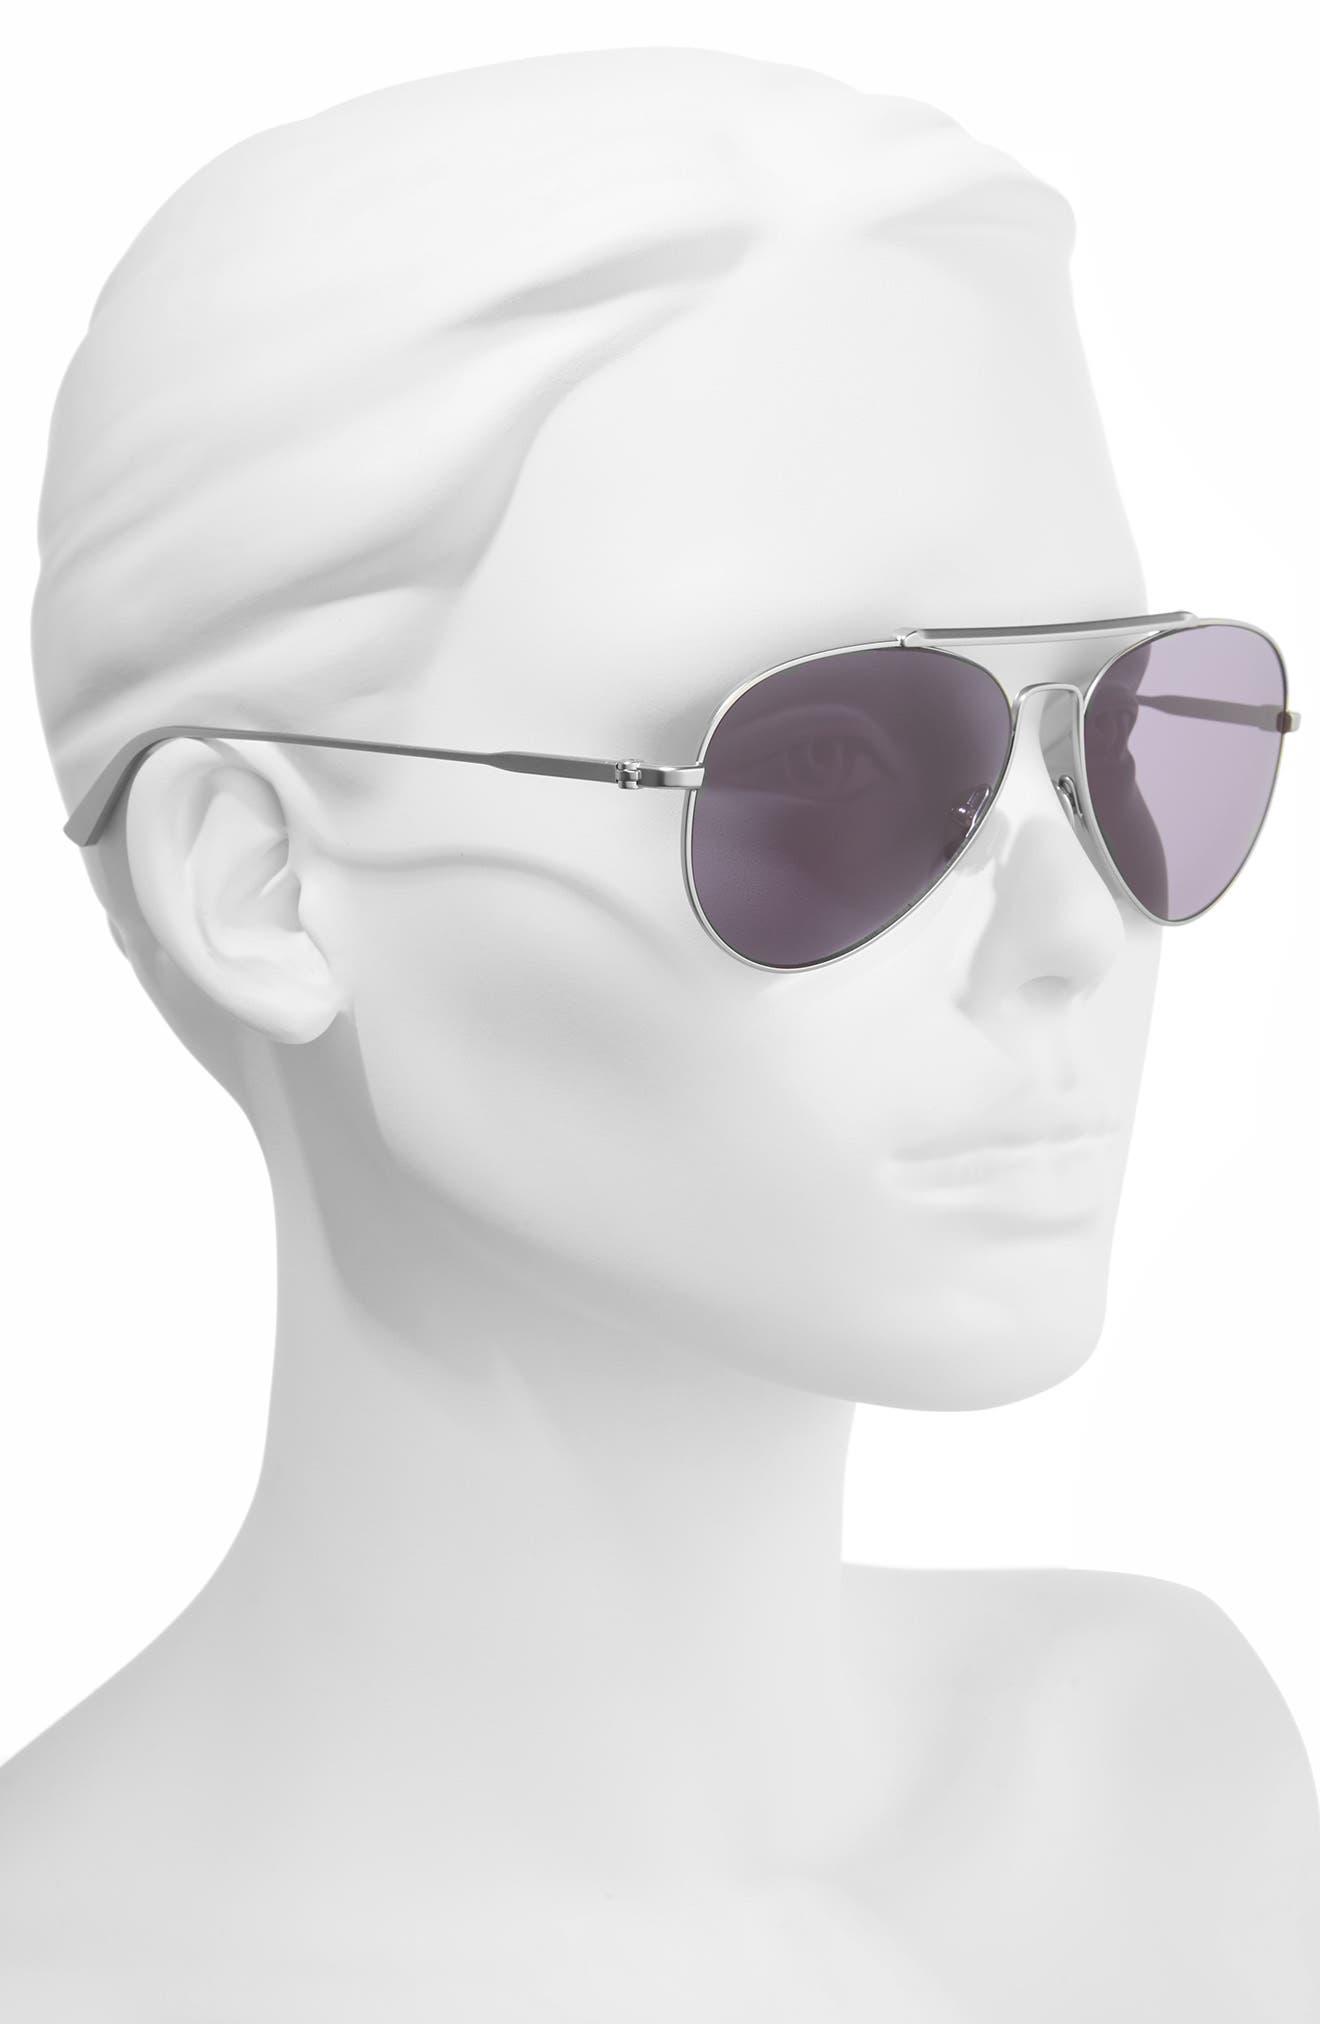 58mm Aviator Sunglasses,                             Alternate thumbnail 2, color,                             040